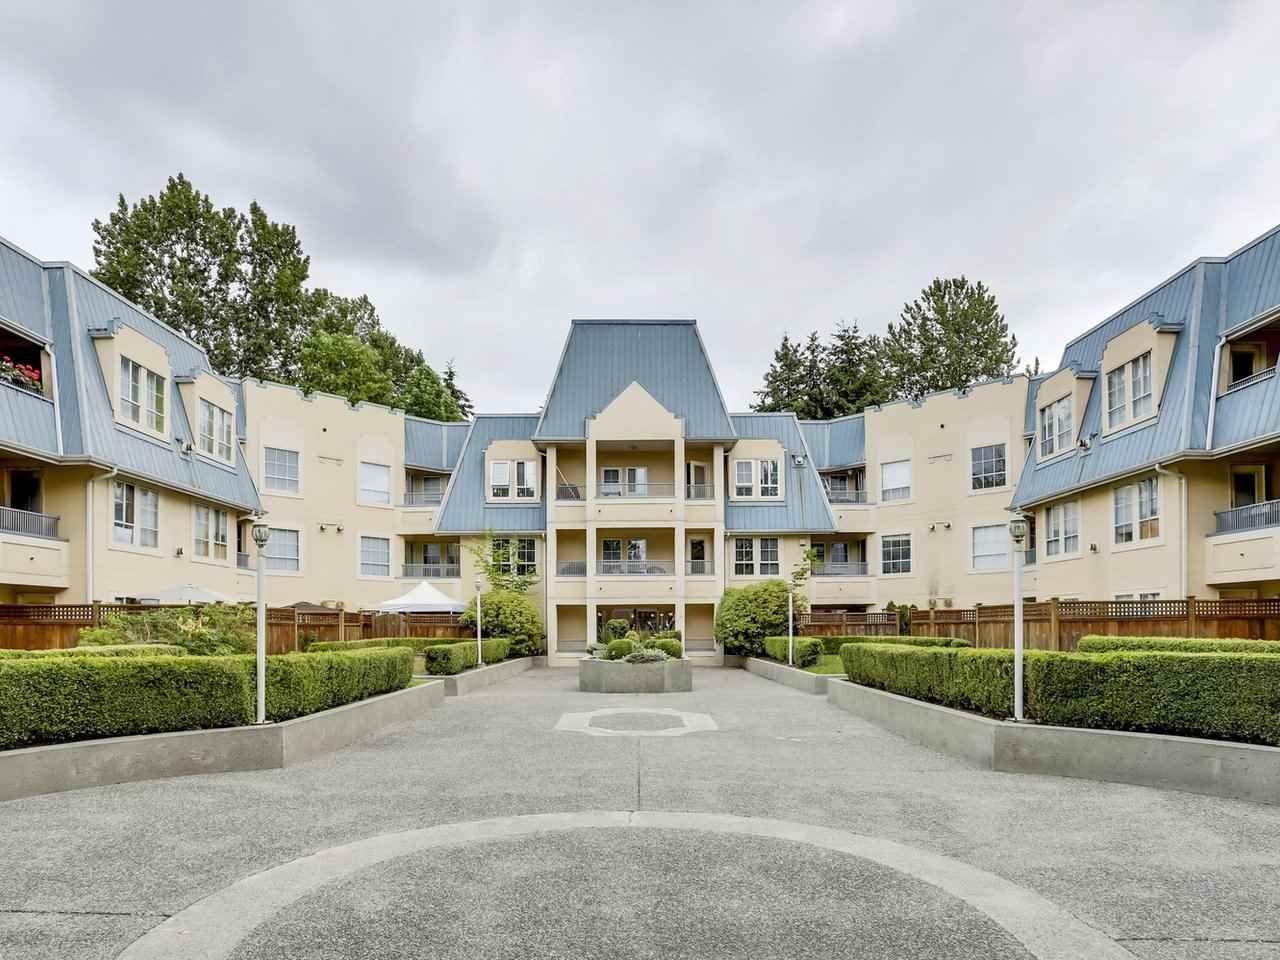 Main Photo: 107 295 SCHOOLHOUSE Street in Coquitlam: Maillardville Condo for sale : MLS®# R2286753